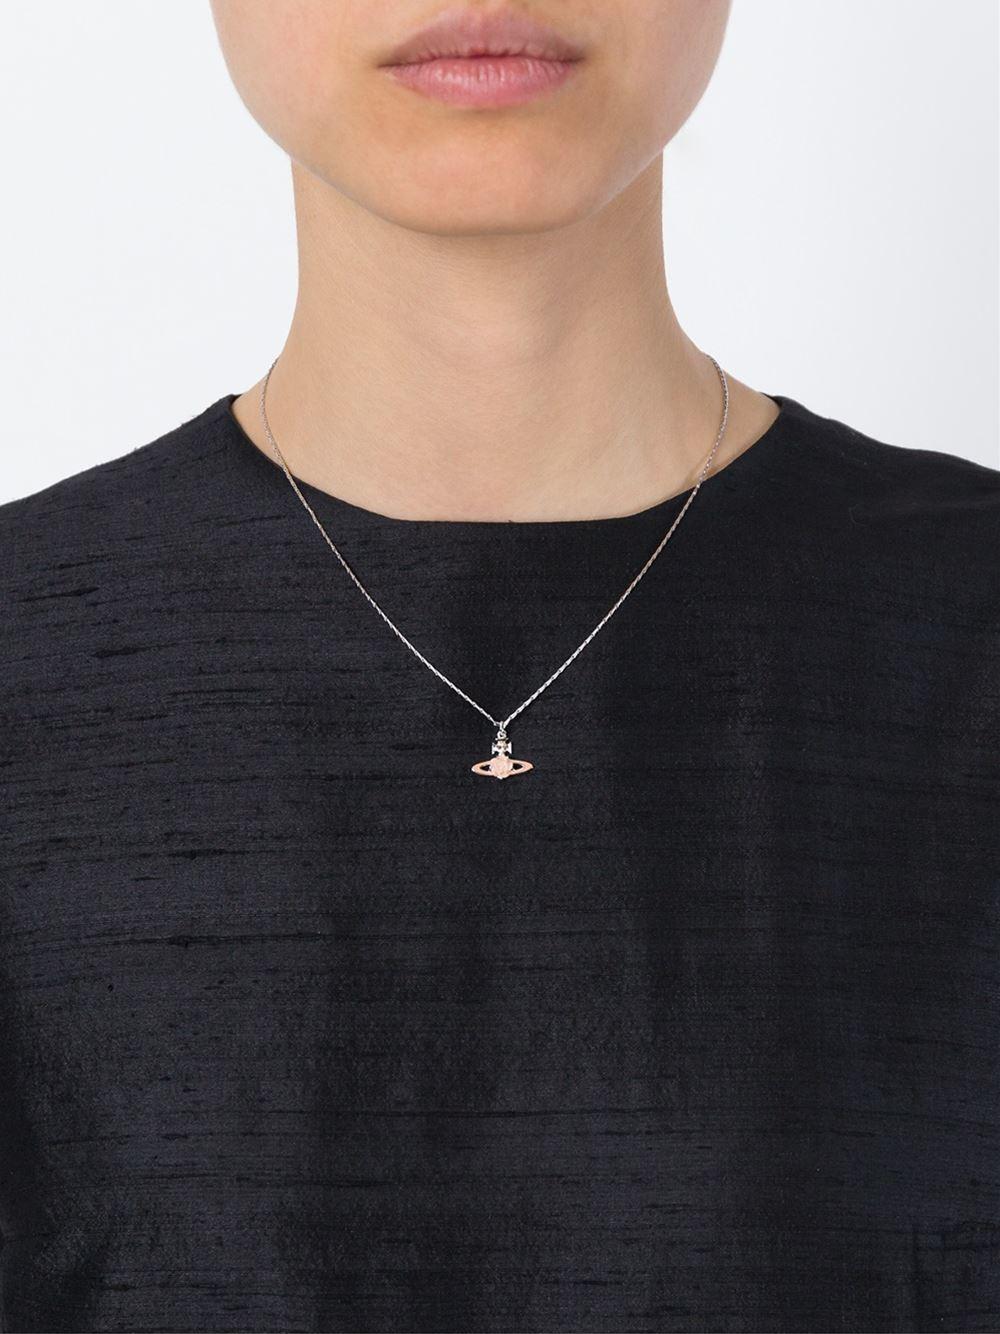 Vivienne Westwood Flower Orb Pendant Necklace In Metallic